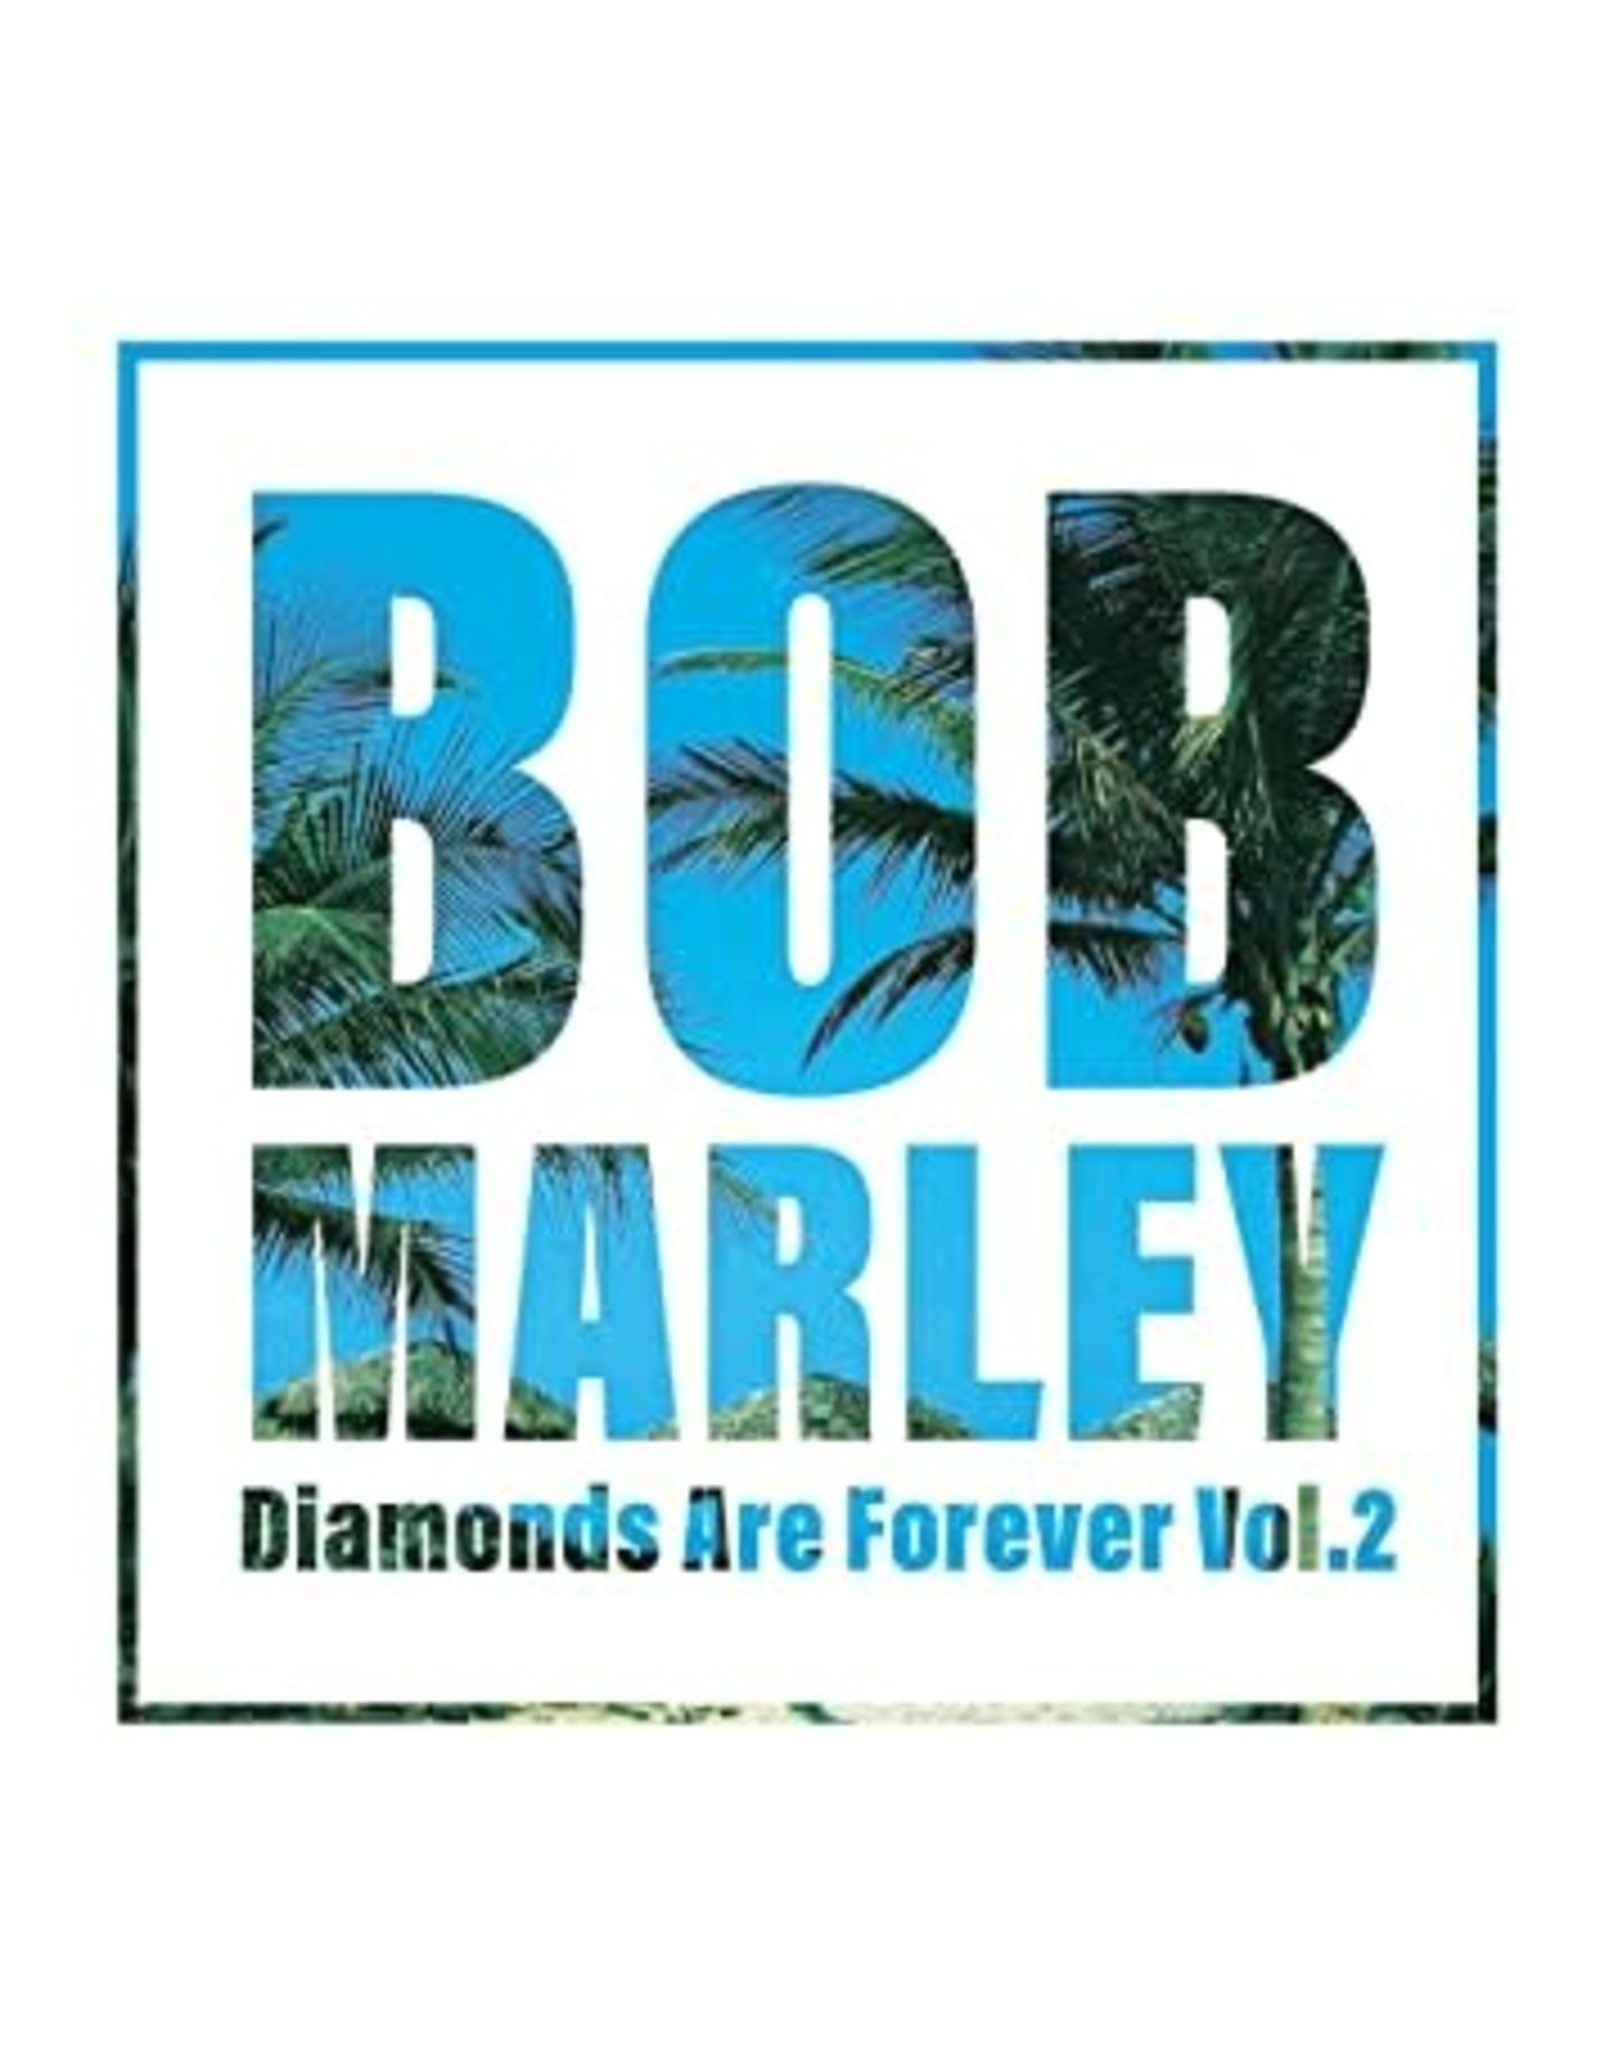 New Vinyl Bob Marley - Diamonds Are Forever Vol. 2 2LP